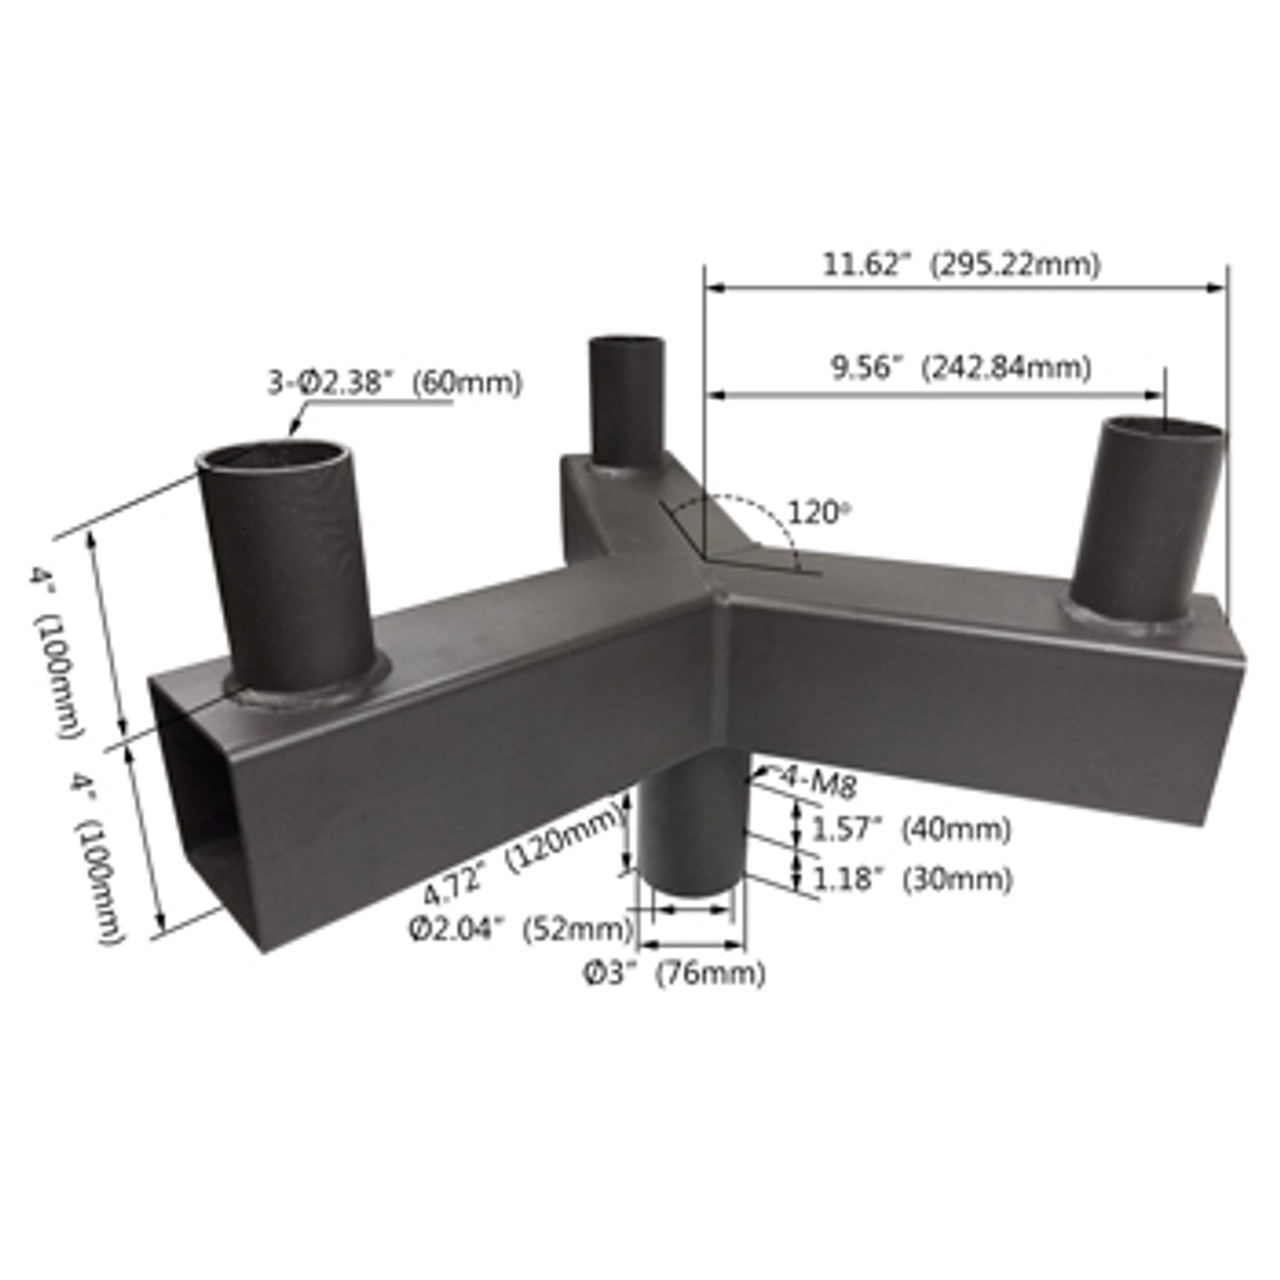 Triple Square Vertical Tenon for 3 fixtures - dimensions